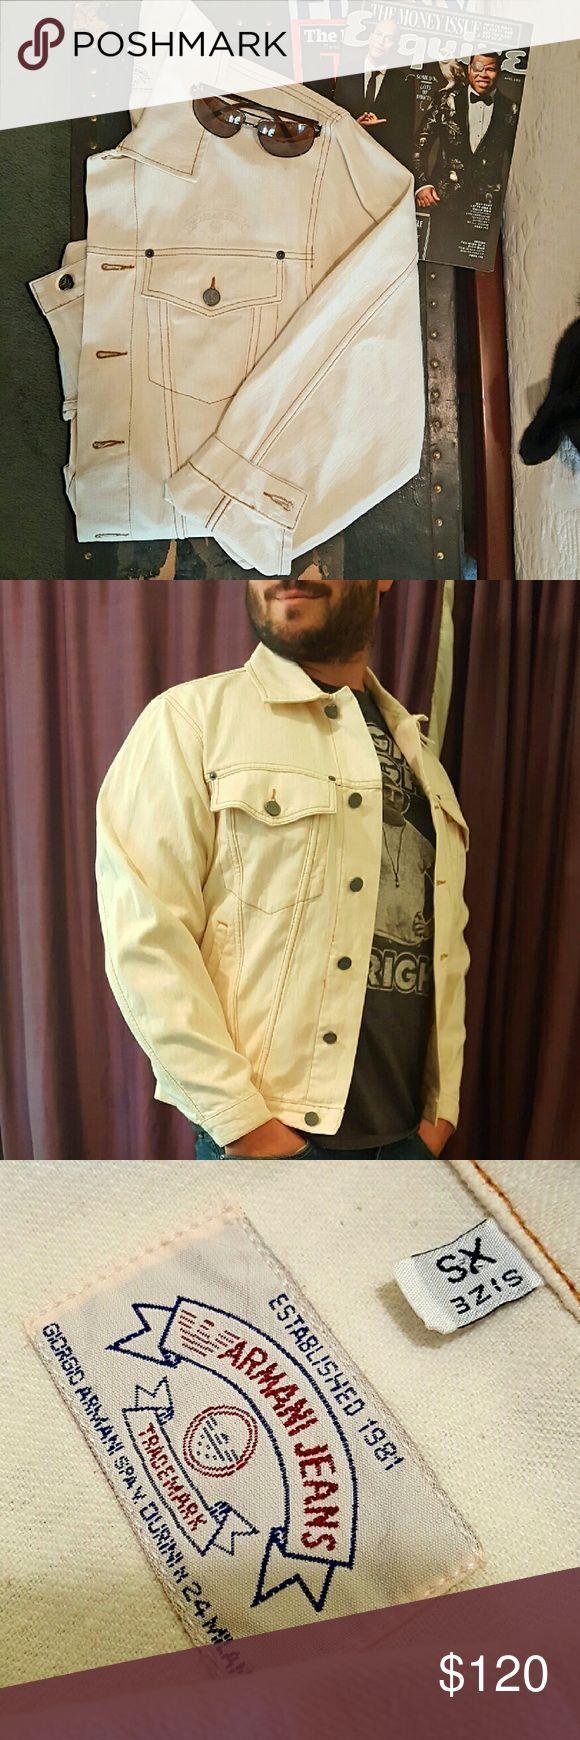 Armani Jeans - Jean Jacket Almost Vintage Men's Armani Jean Jacket. Incredibly well taken care of. Killer fall attire. Armani Jeans Jackets & Coats Lightweight & Shirt Jackets